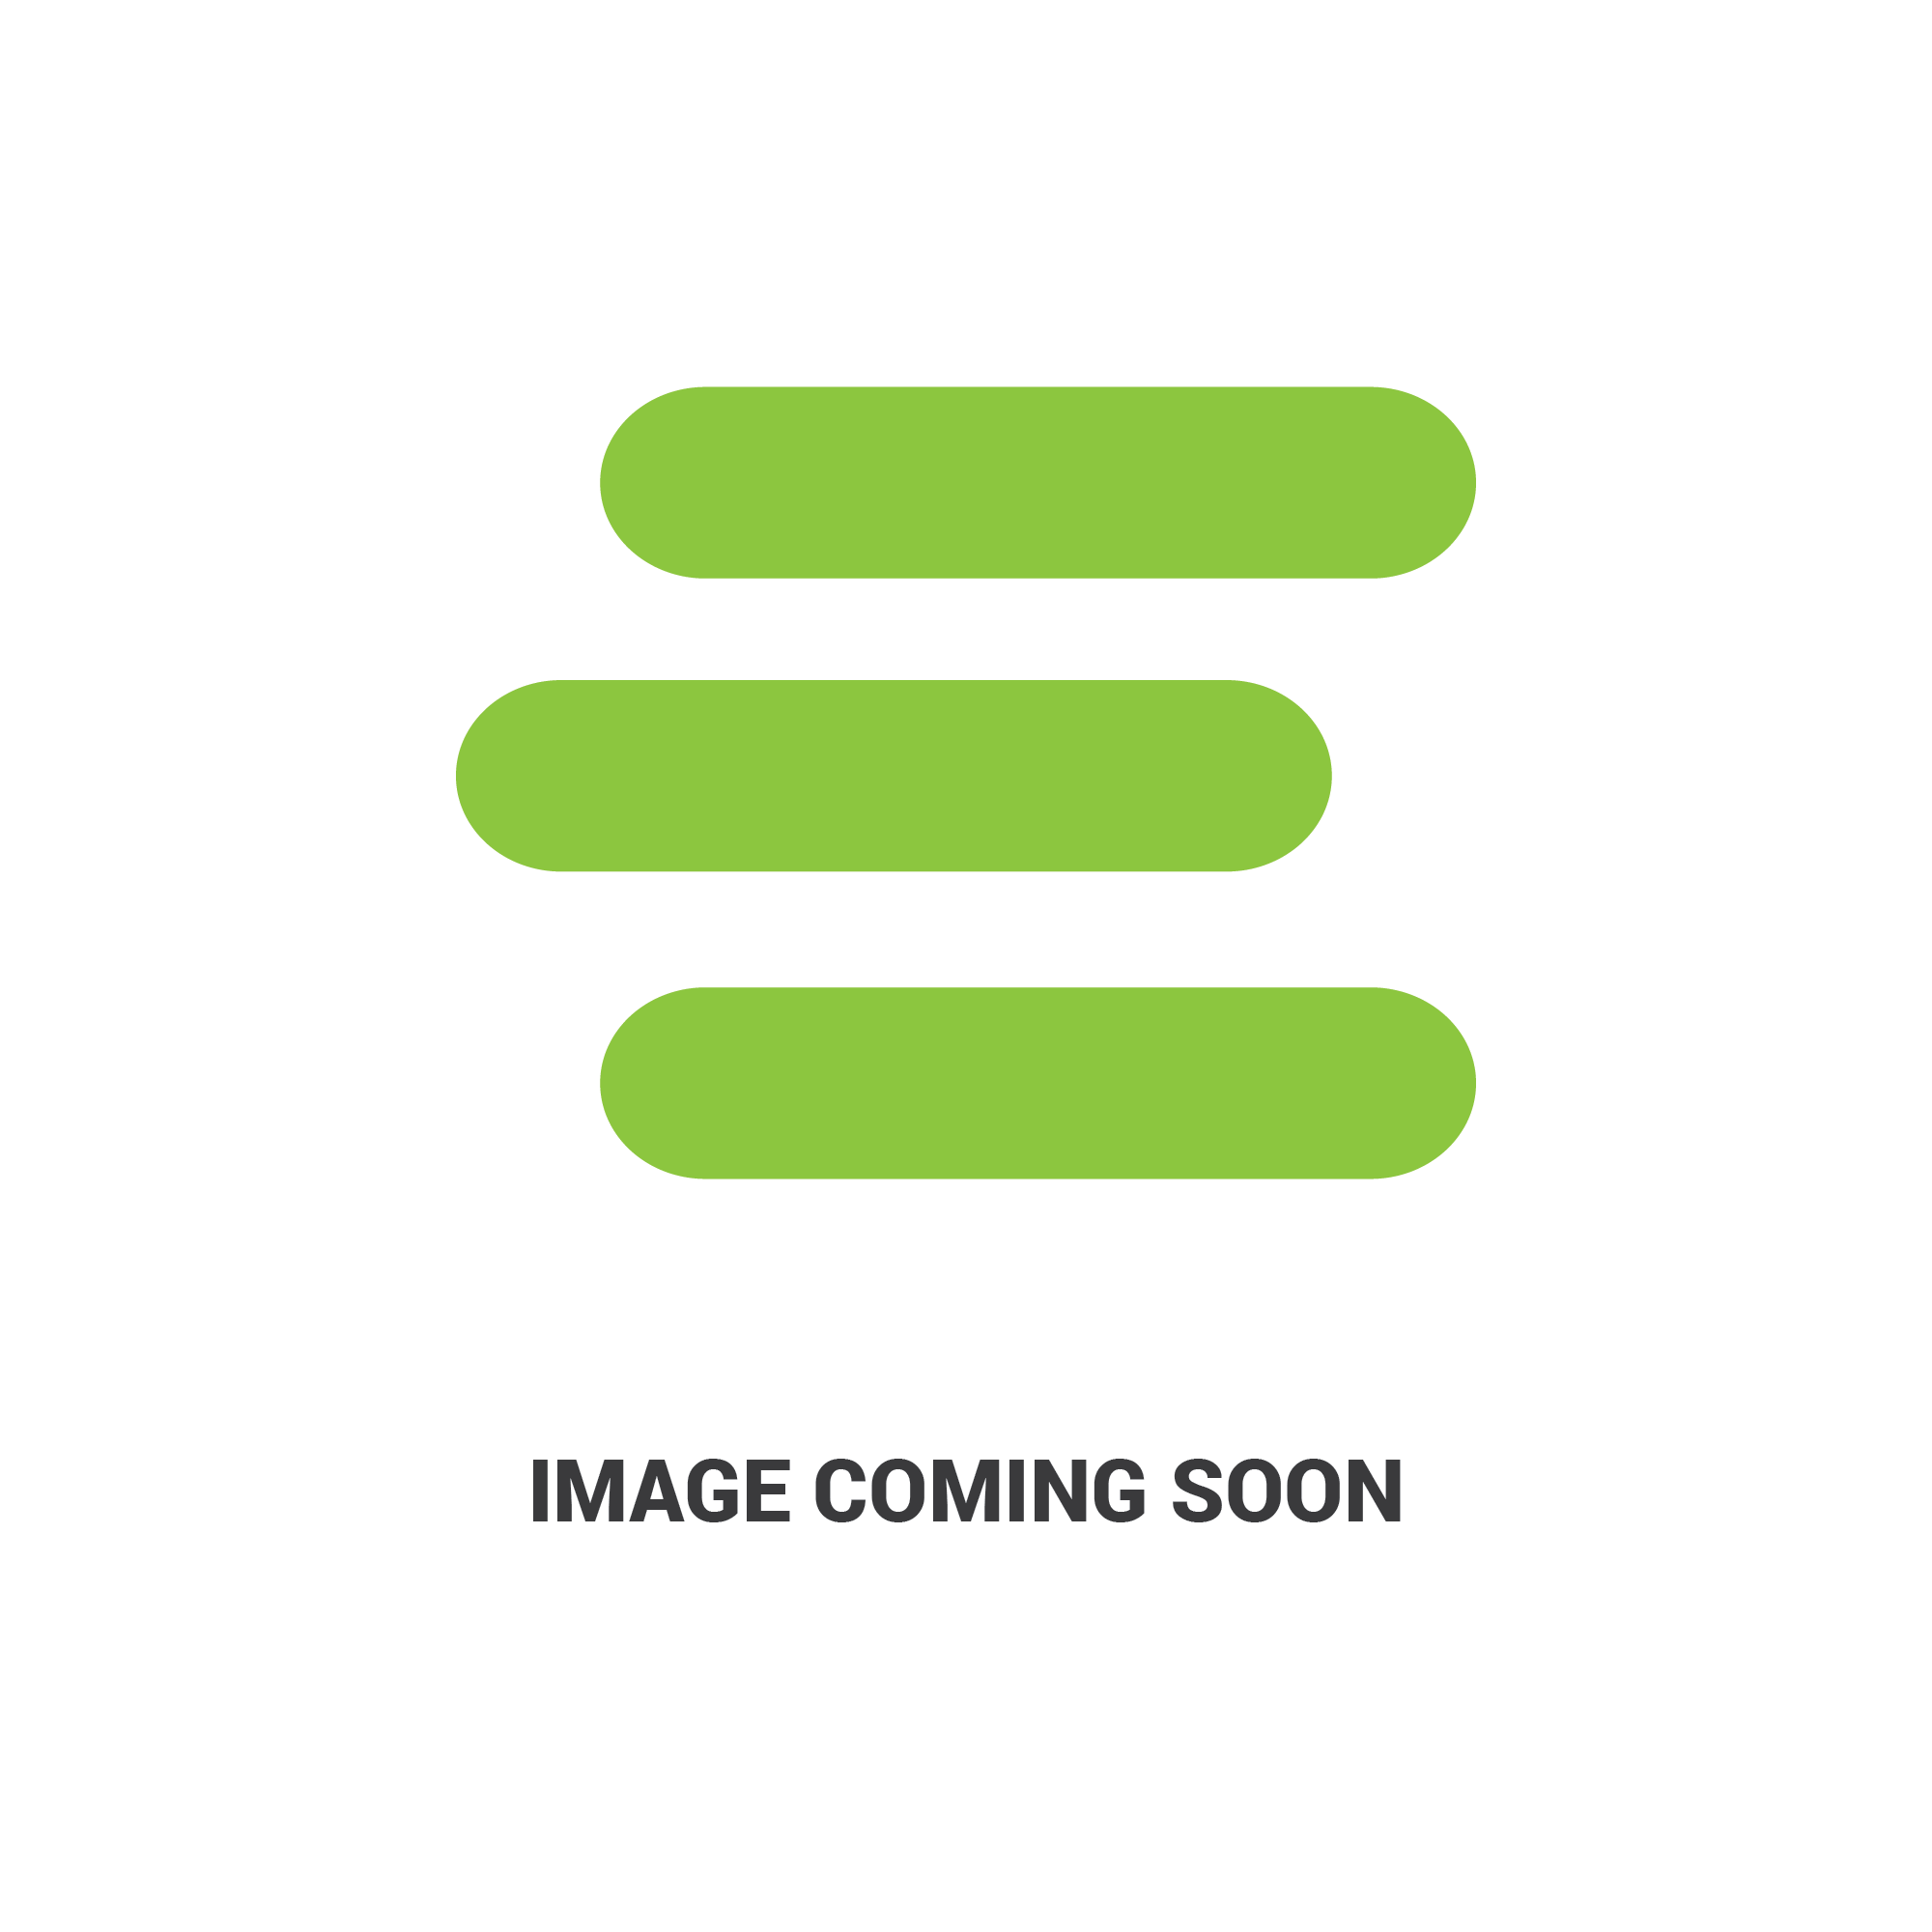 E-70000-16585edit 1.jpg